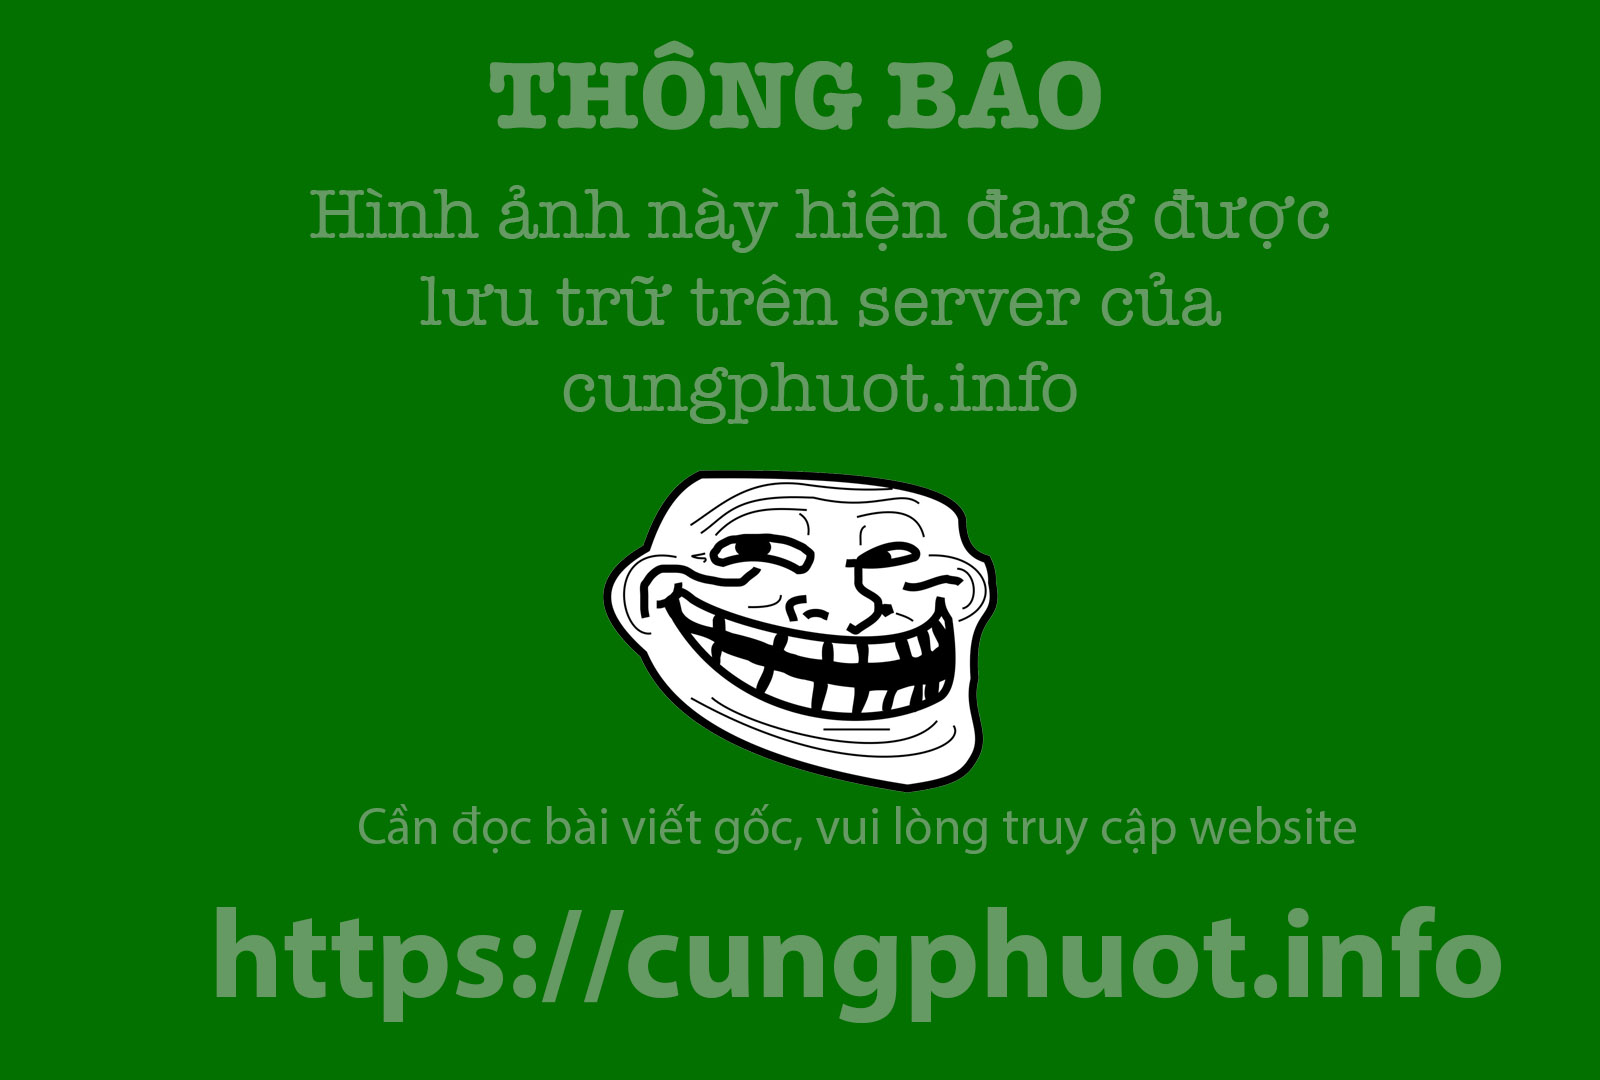 Co do Hue dep la trong suong mu hinh anh 12